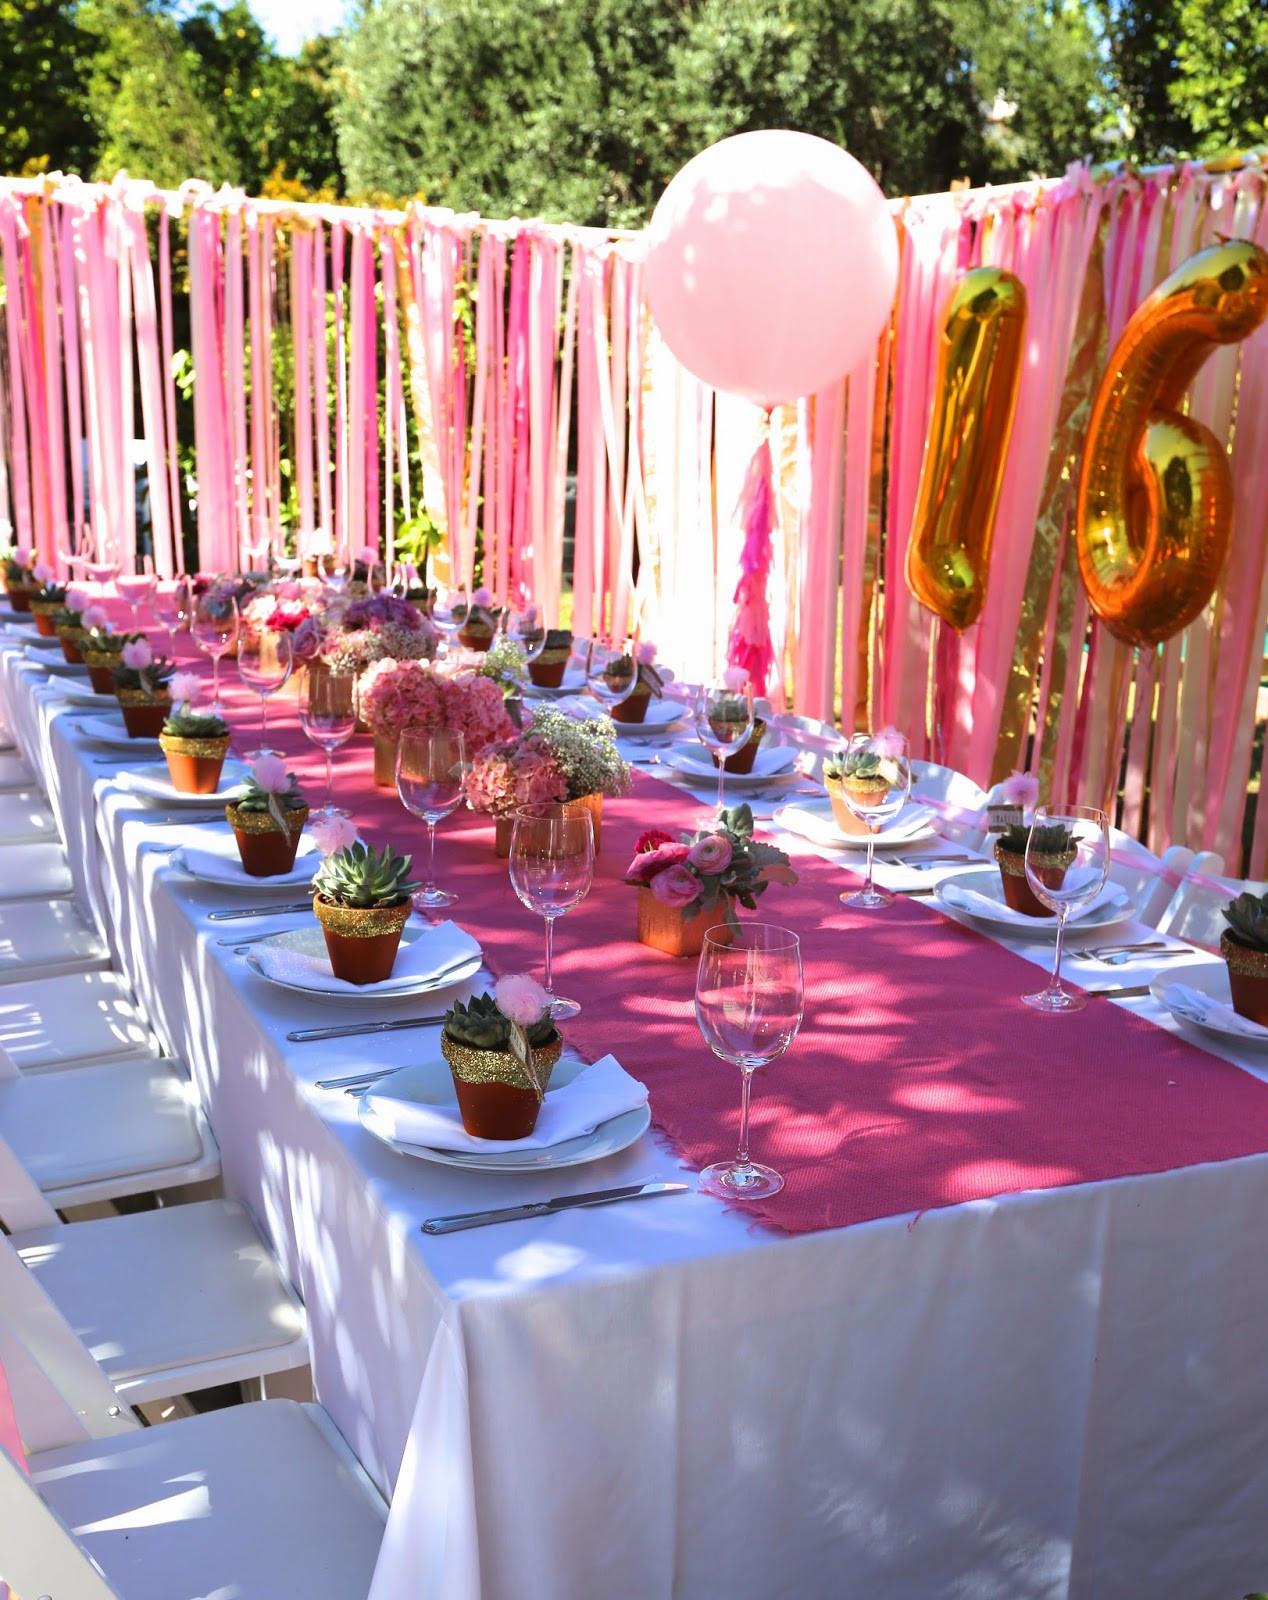 23 Best Backyard Sweet 16 Party Ideas - Home, Family ...